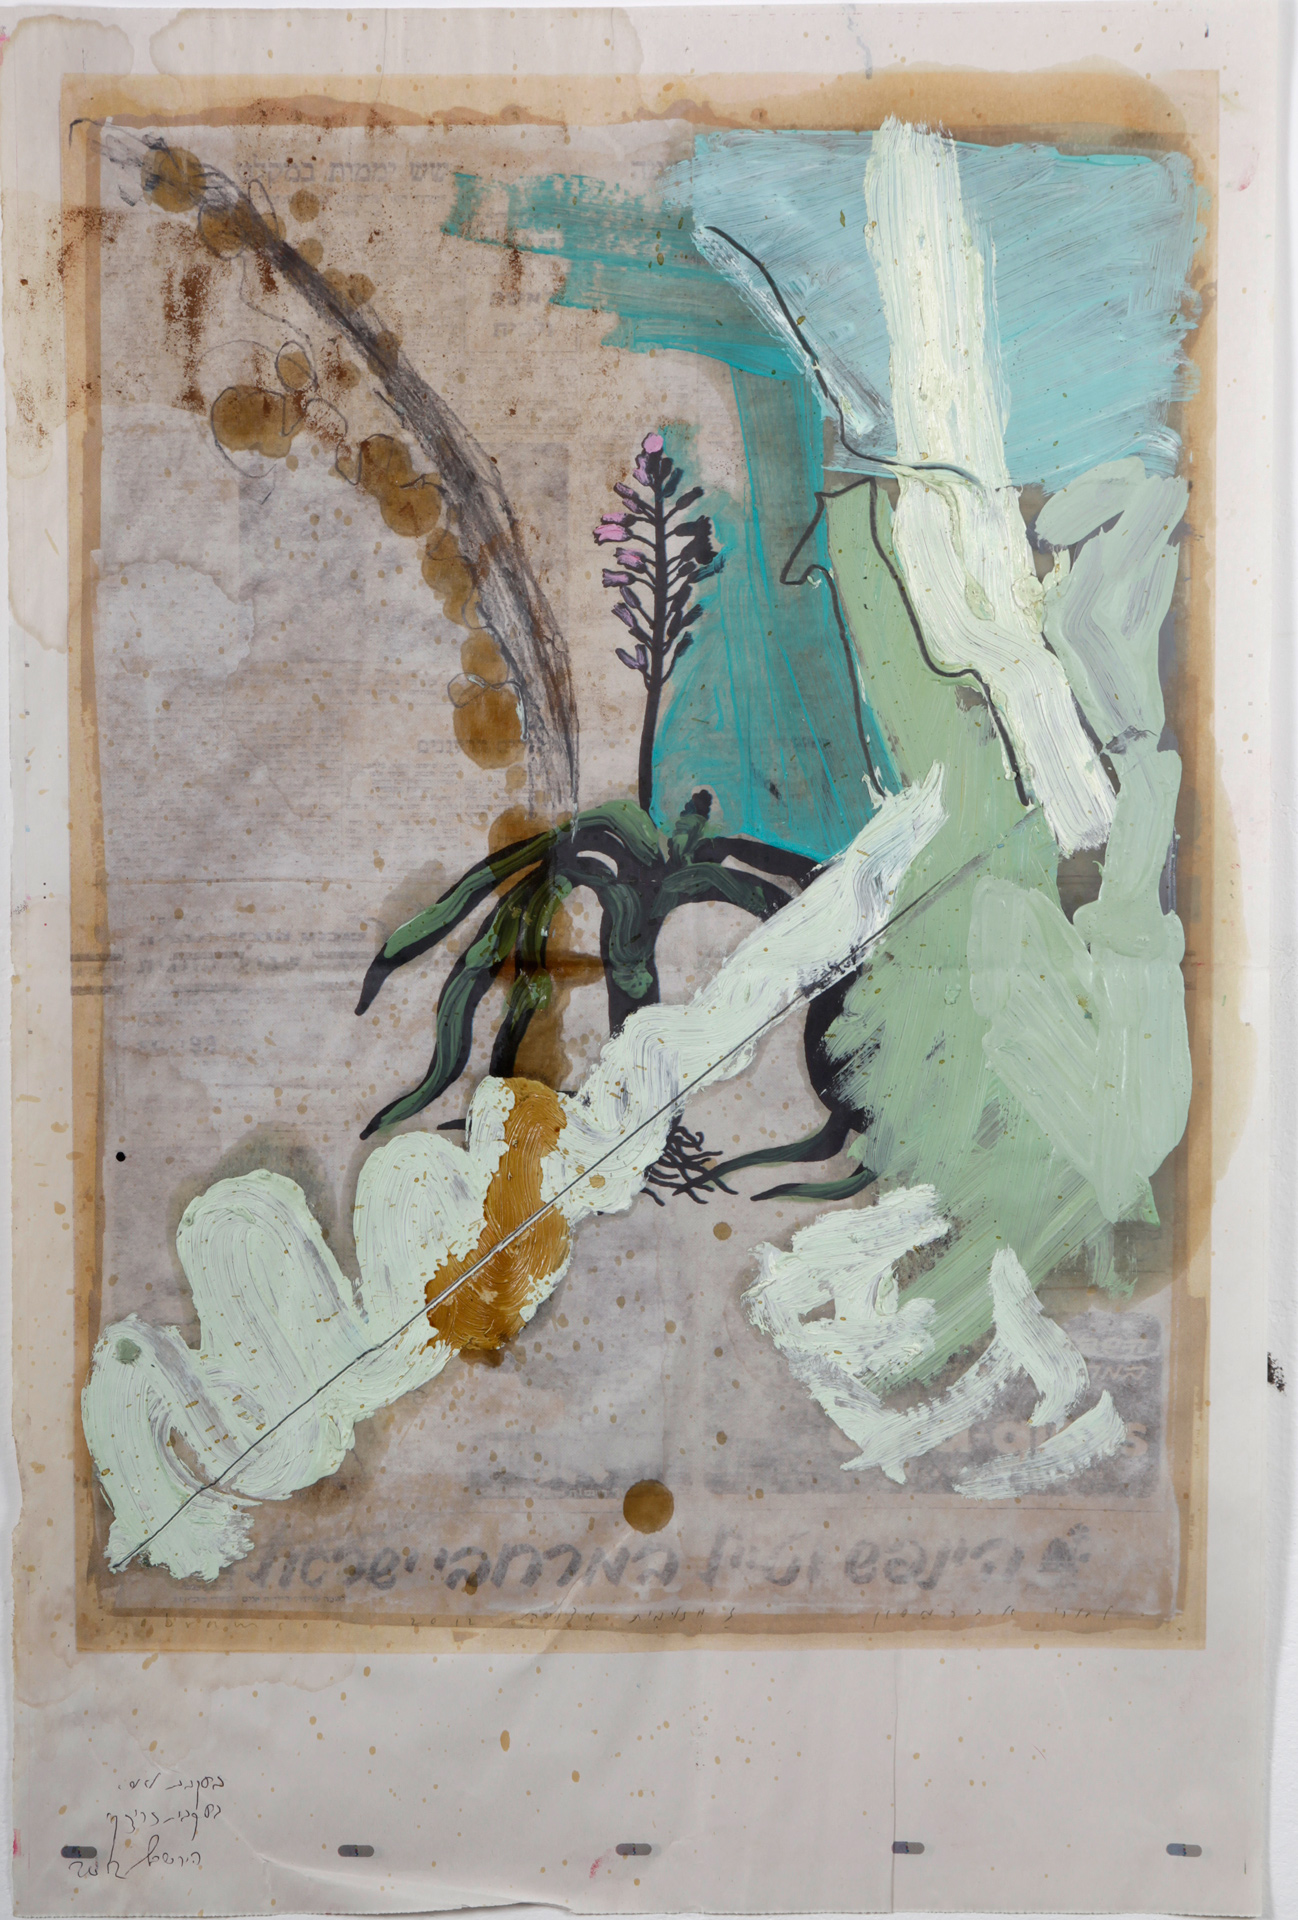 Larizari 4, Oil on readymade, 60X40 cm, 2013